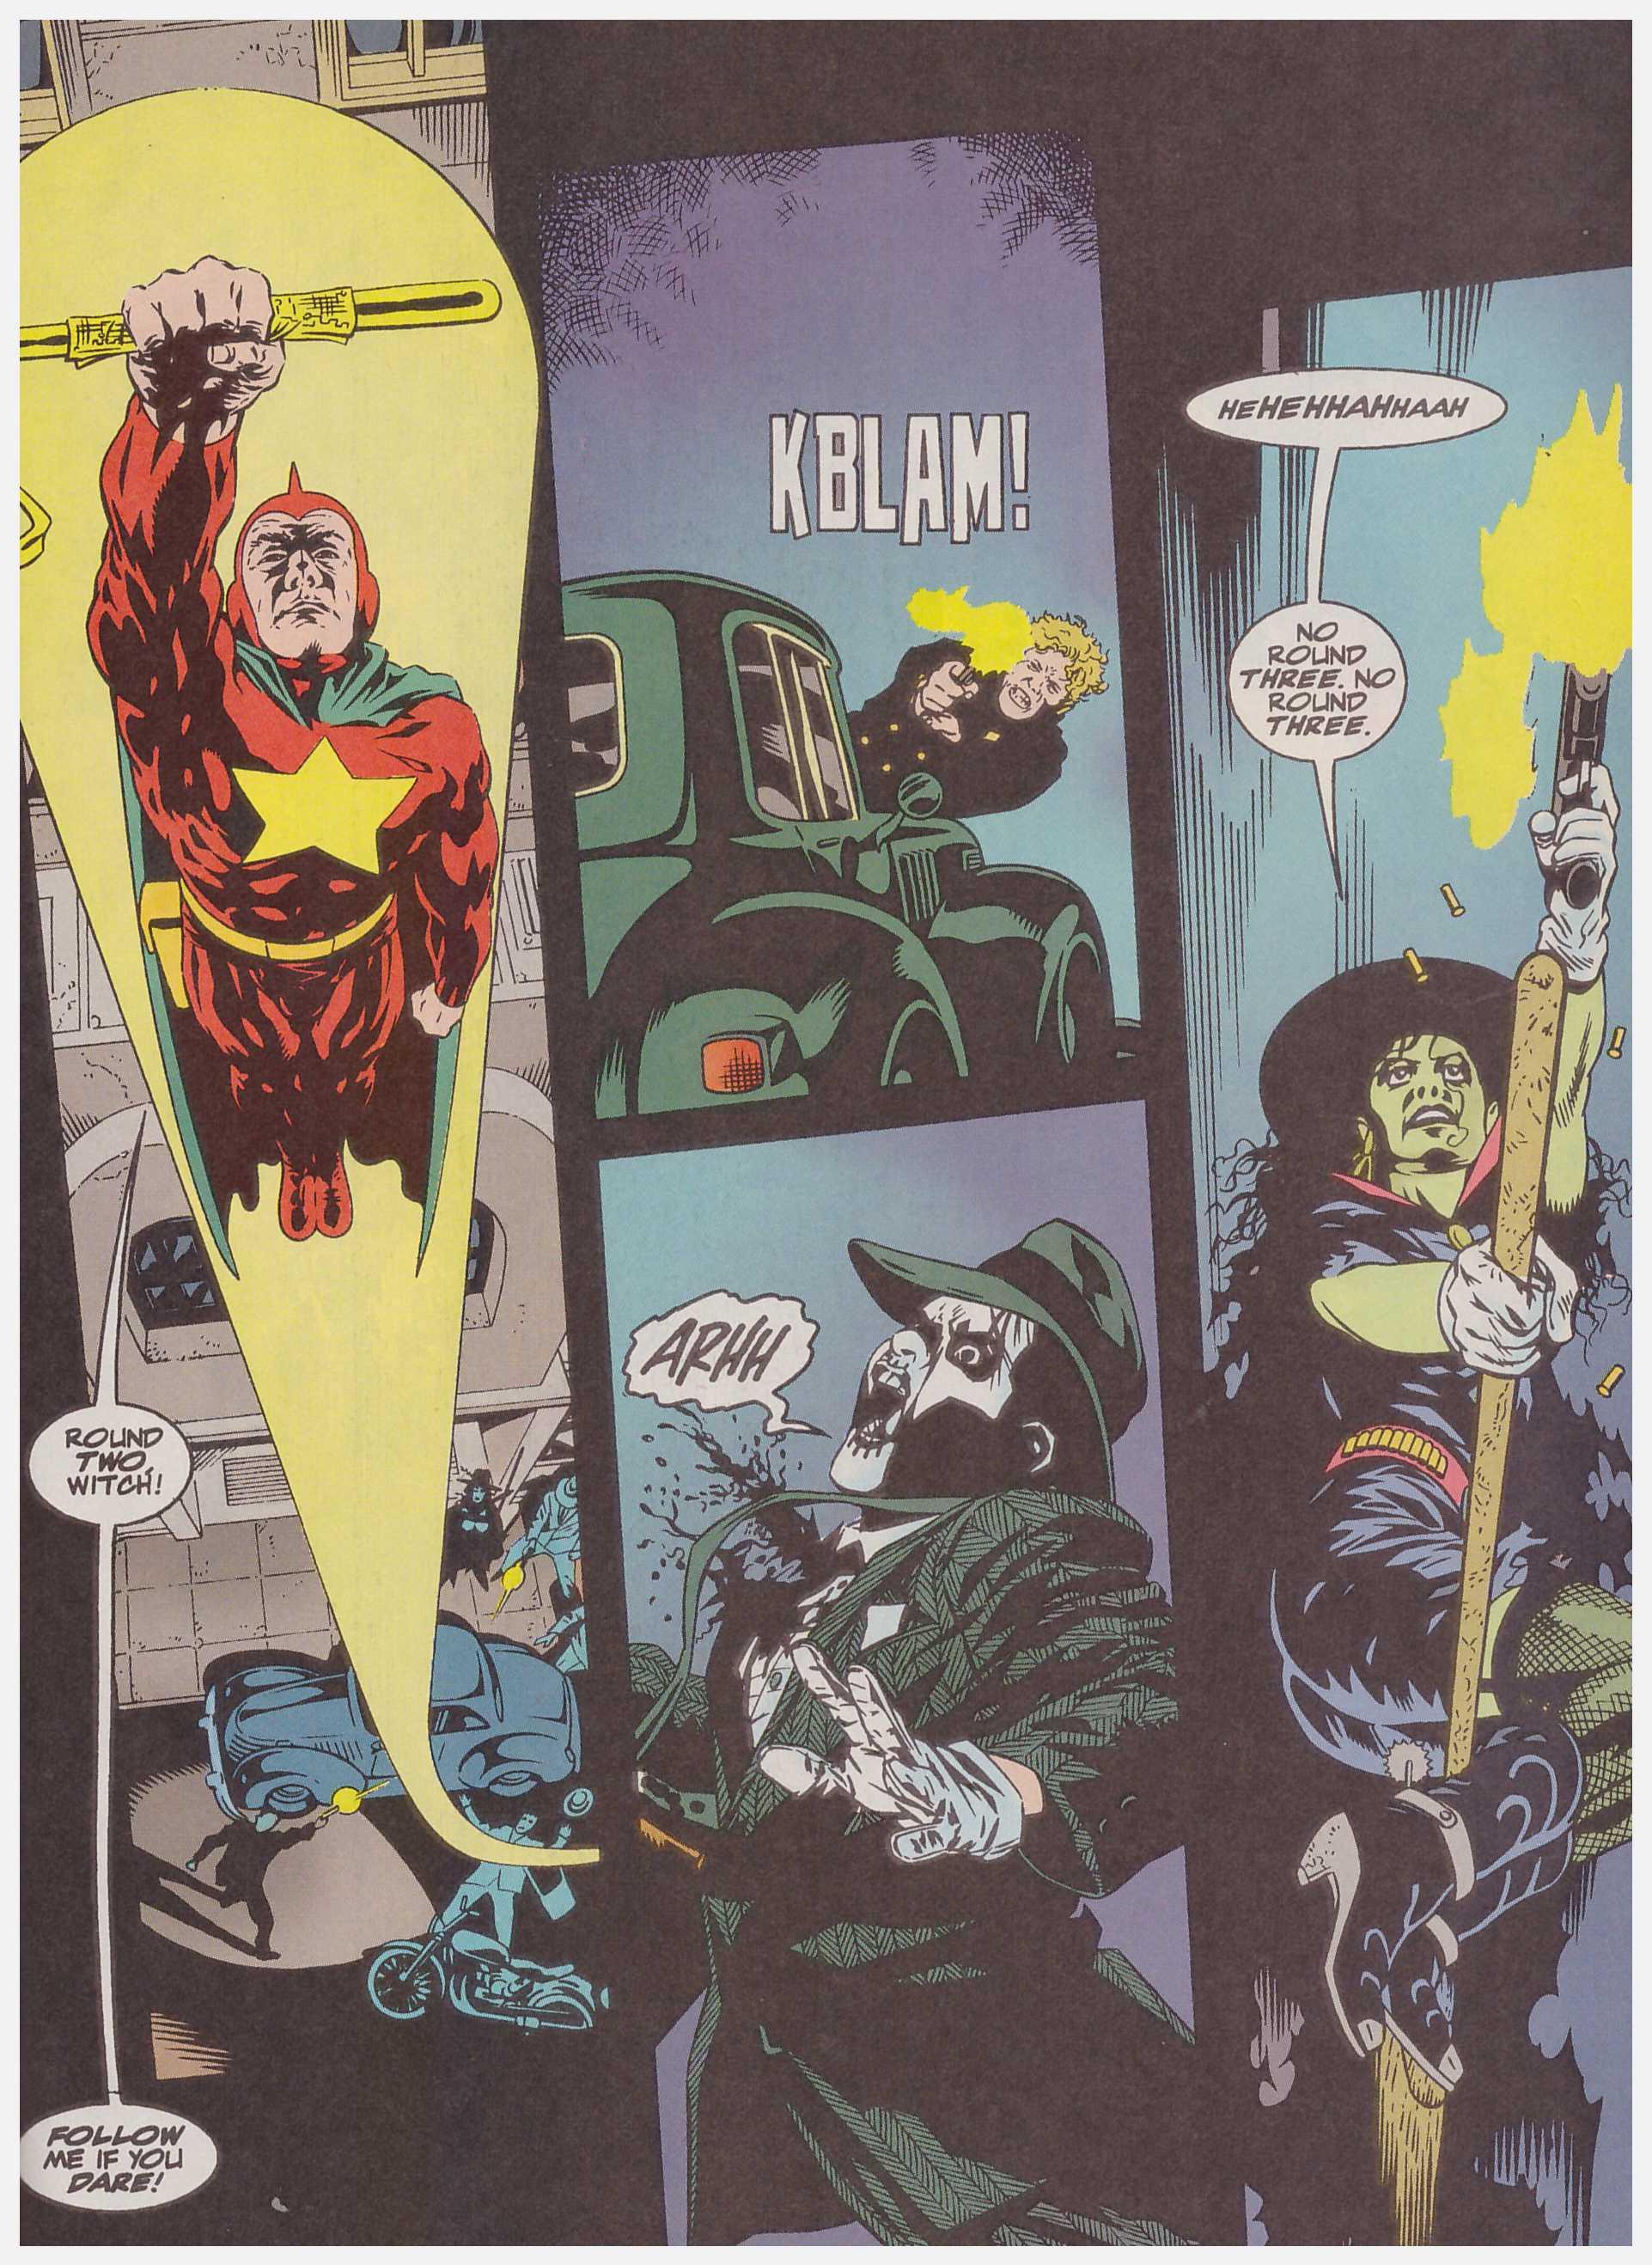 Starman Times Past review